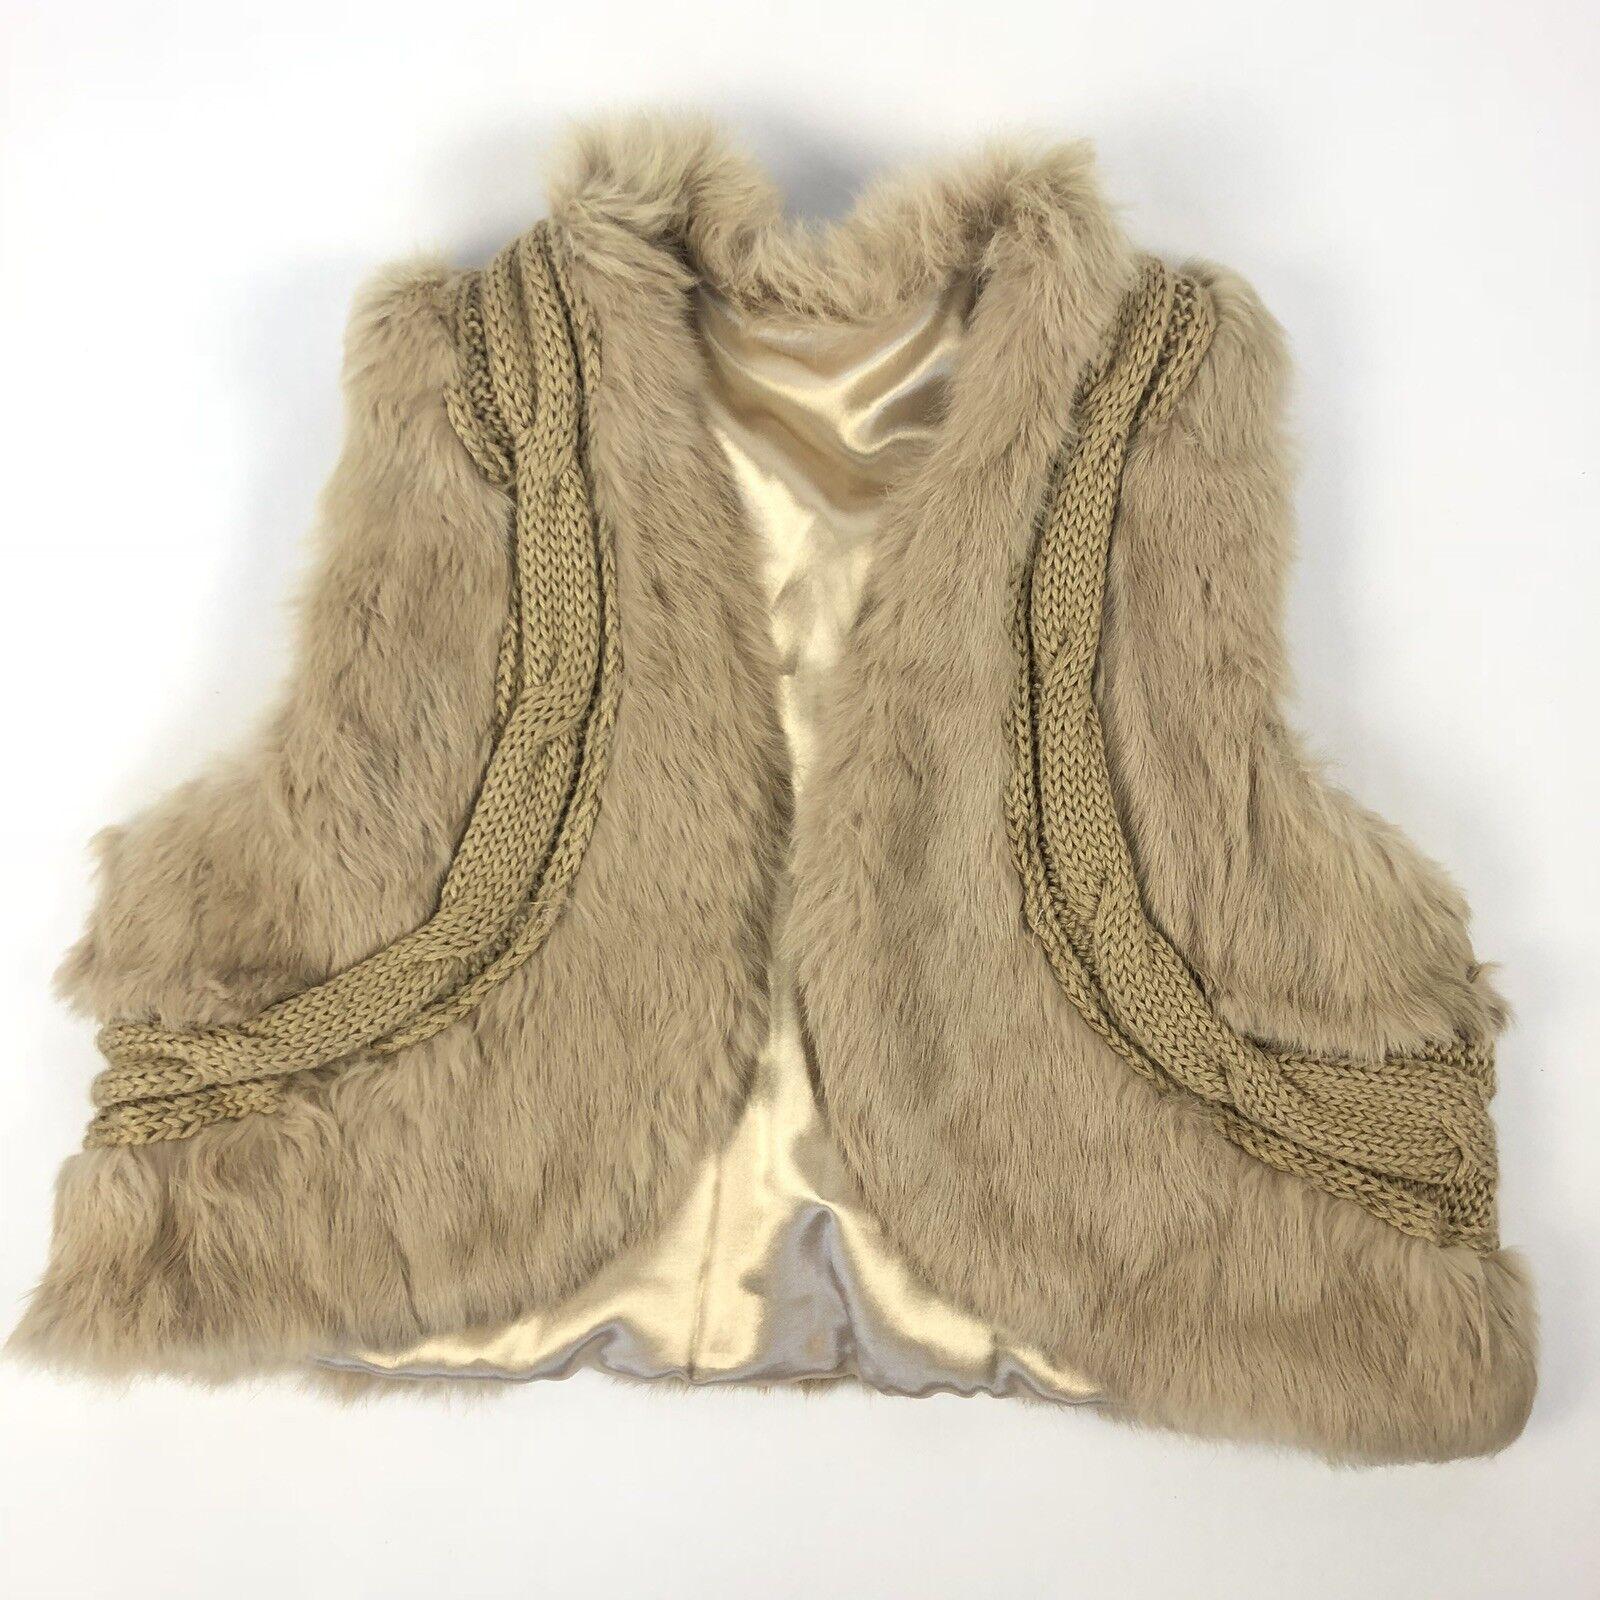 Adrianna Papell M L Tan Sweater Vest Rabbit Fur Trim Satin Lining Luxe